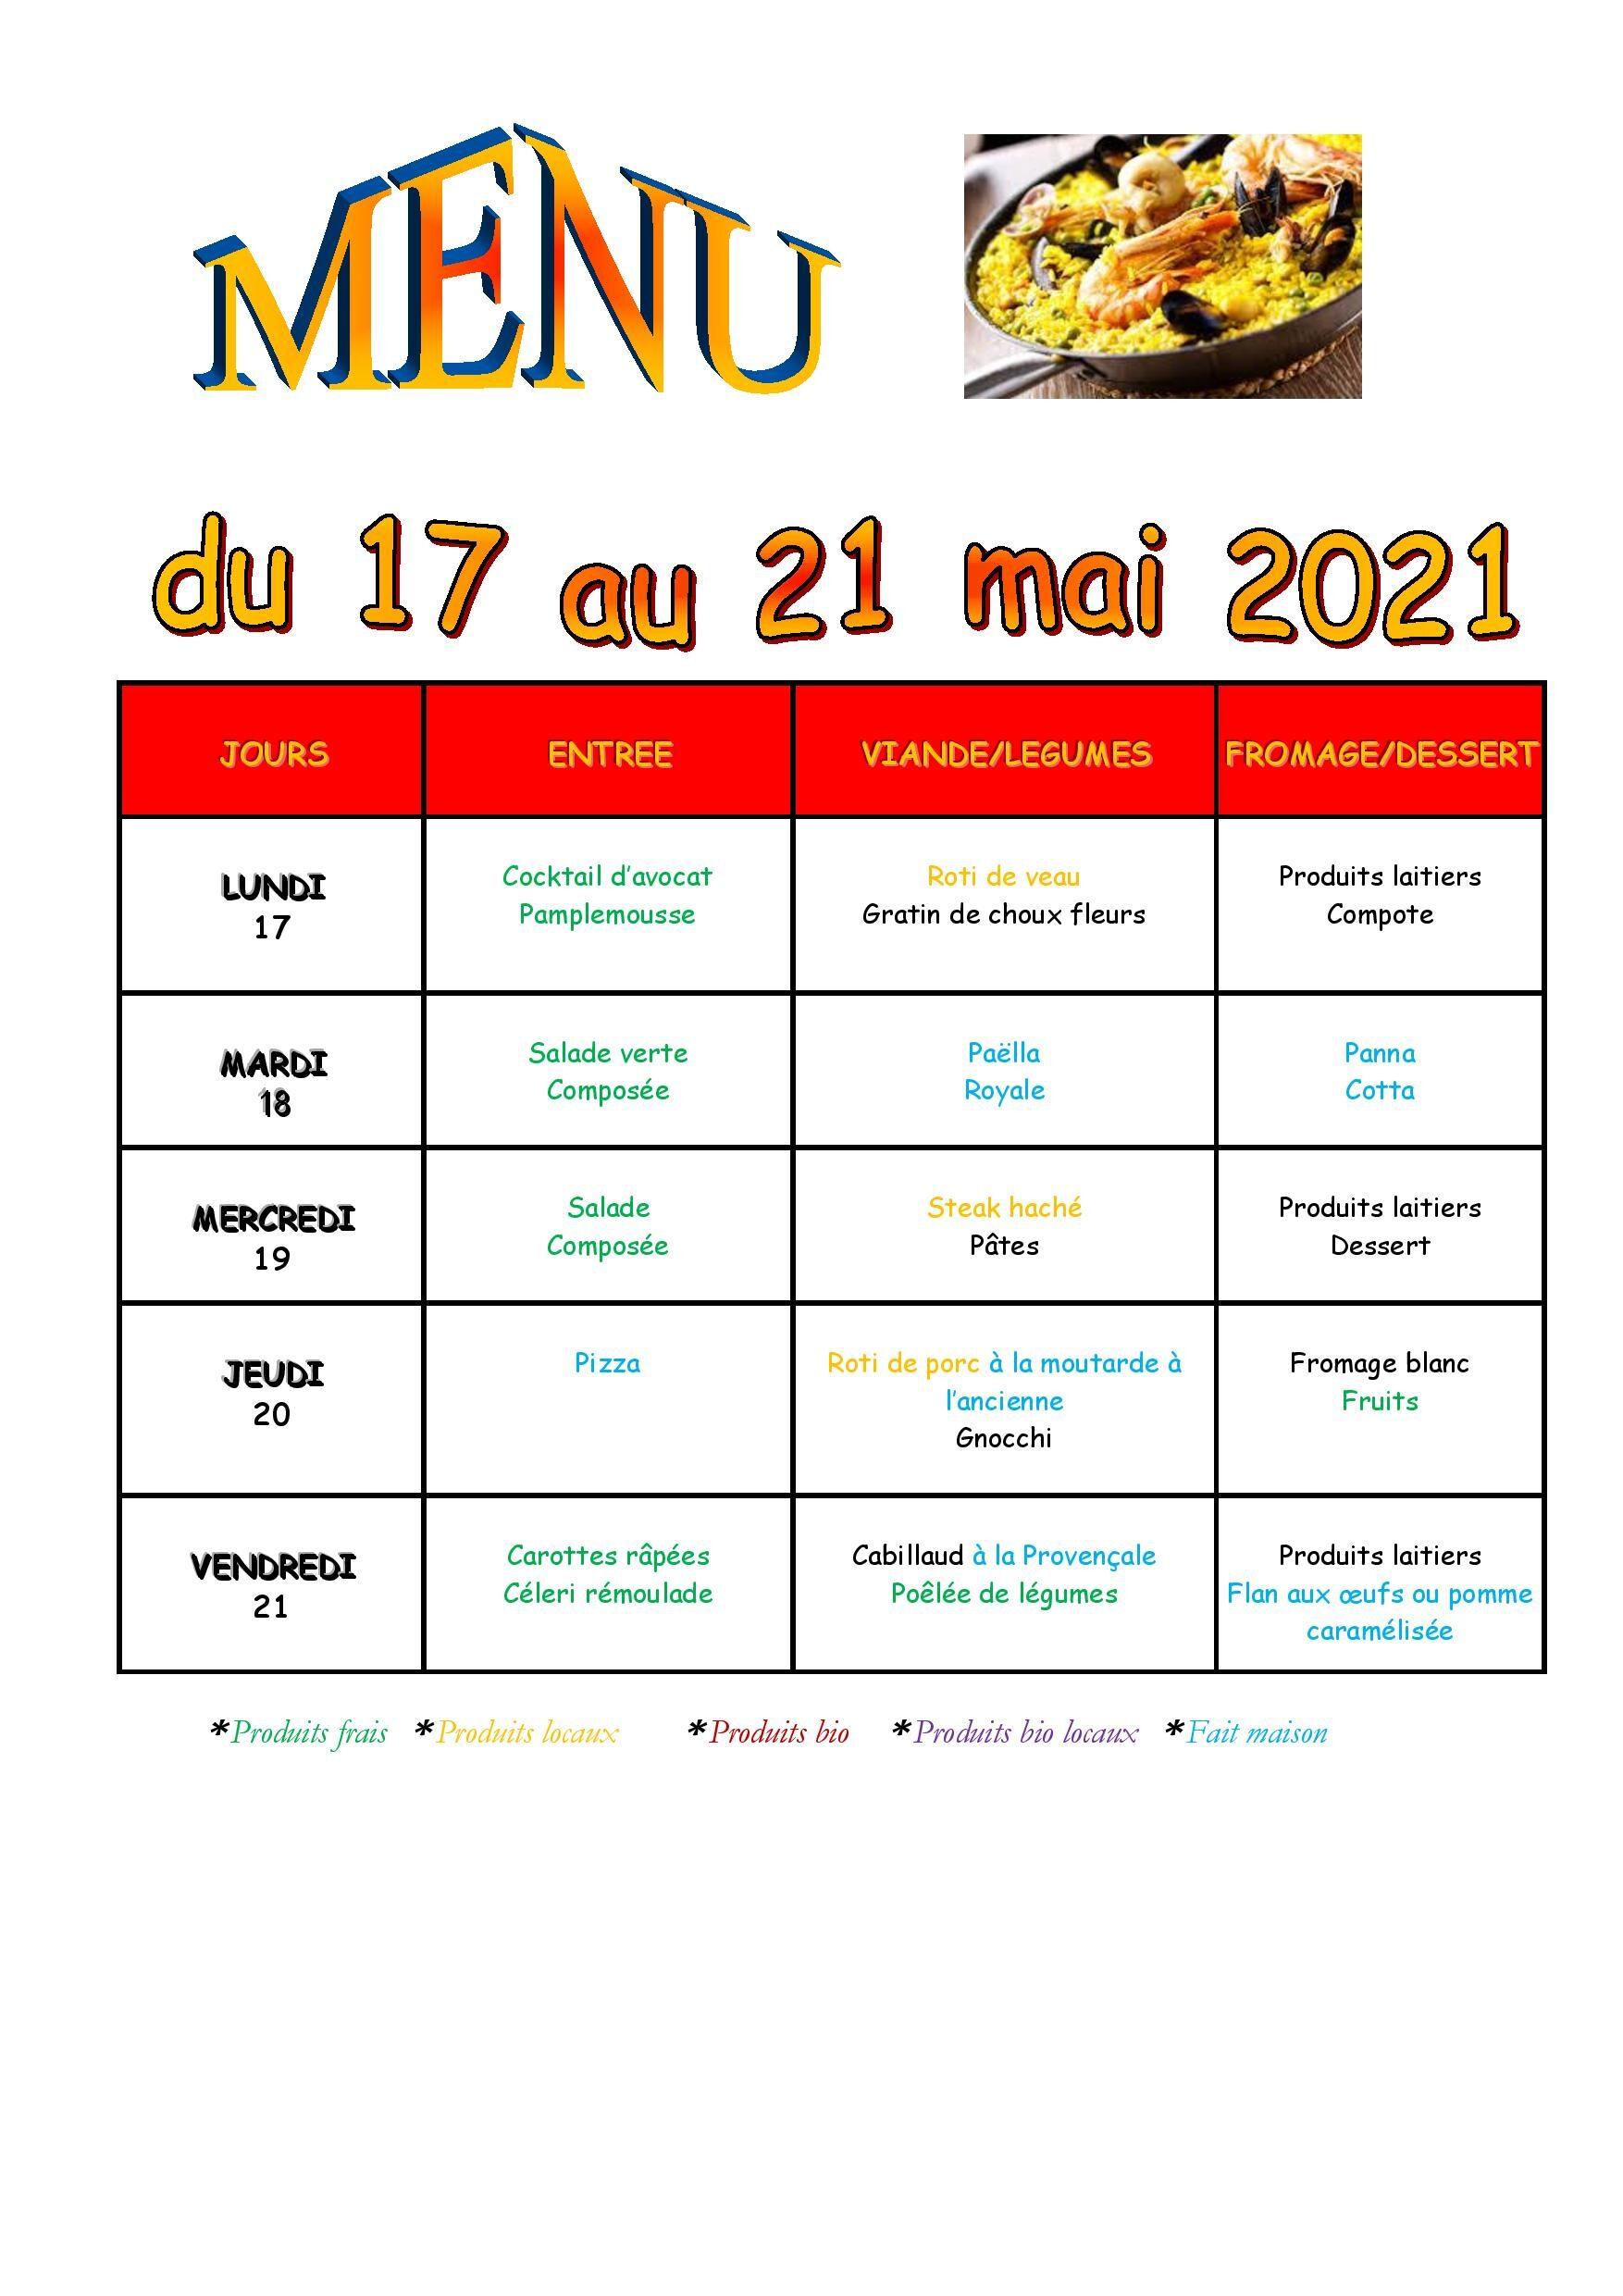 menu du 17 au 21 mai 2021-page-001.jpg